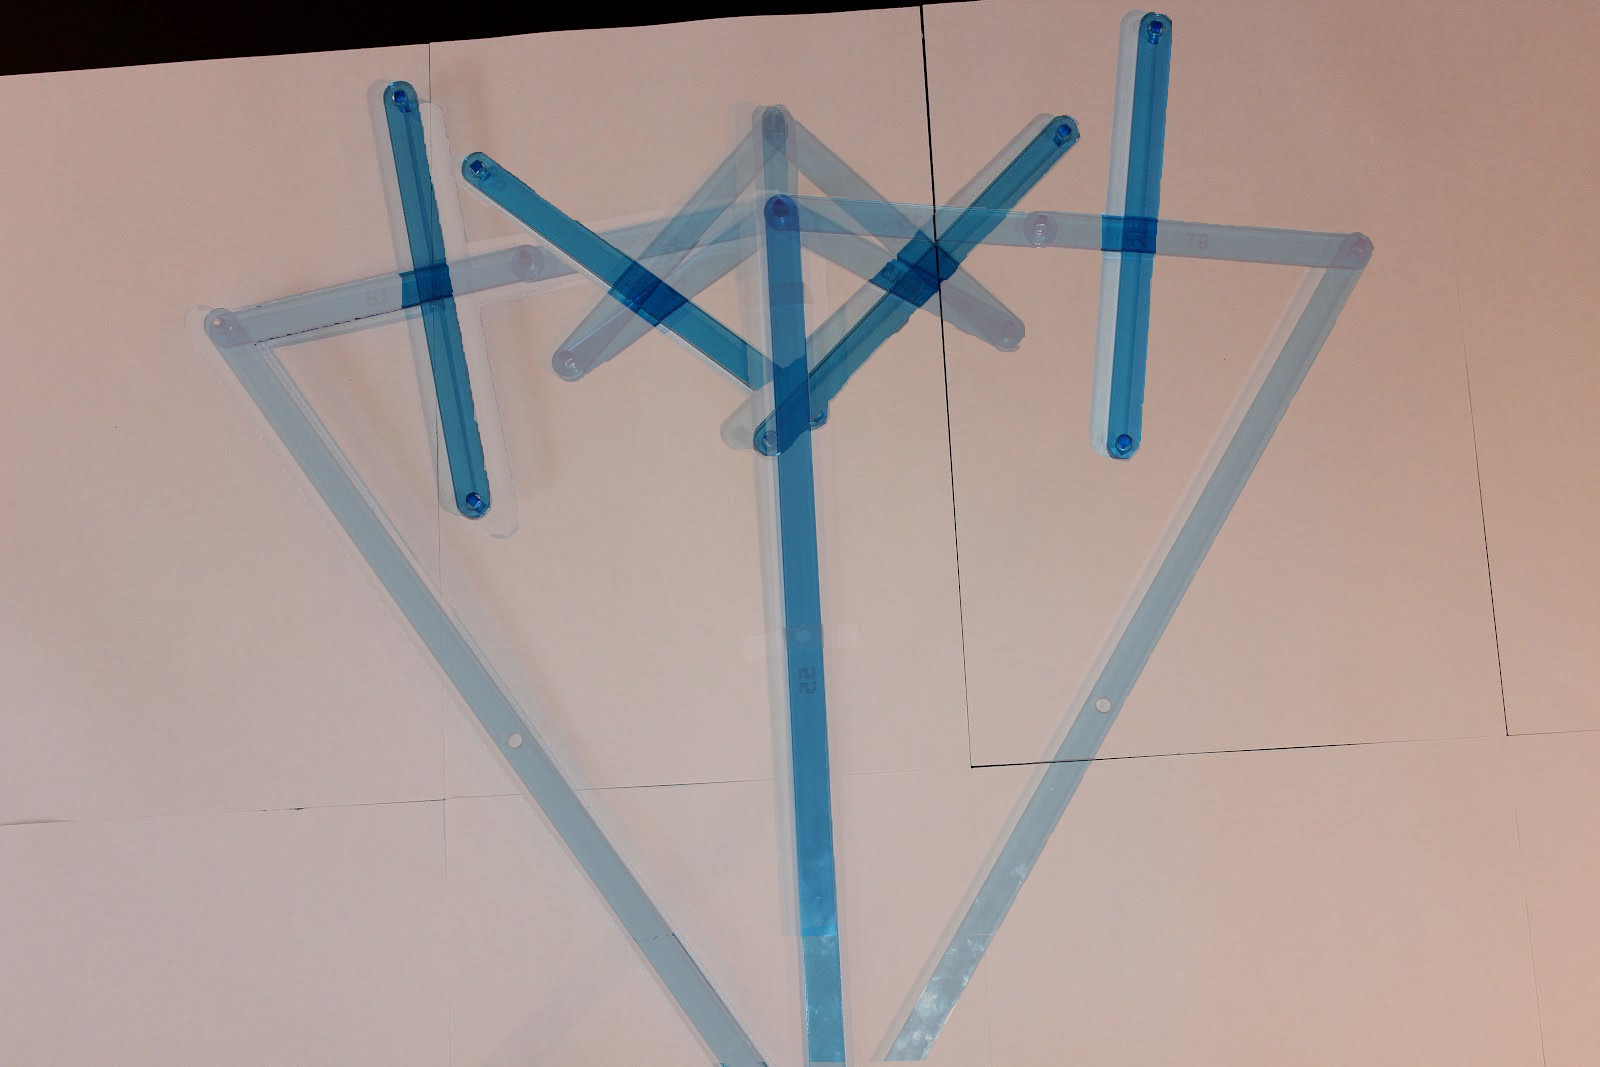 Math Monday, Linkages Part 4: Four Bars, Four Positions